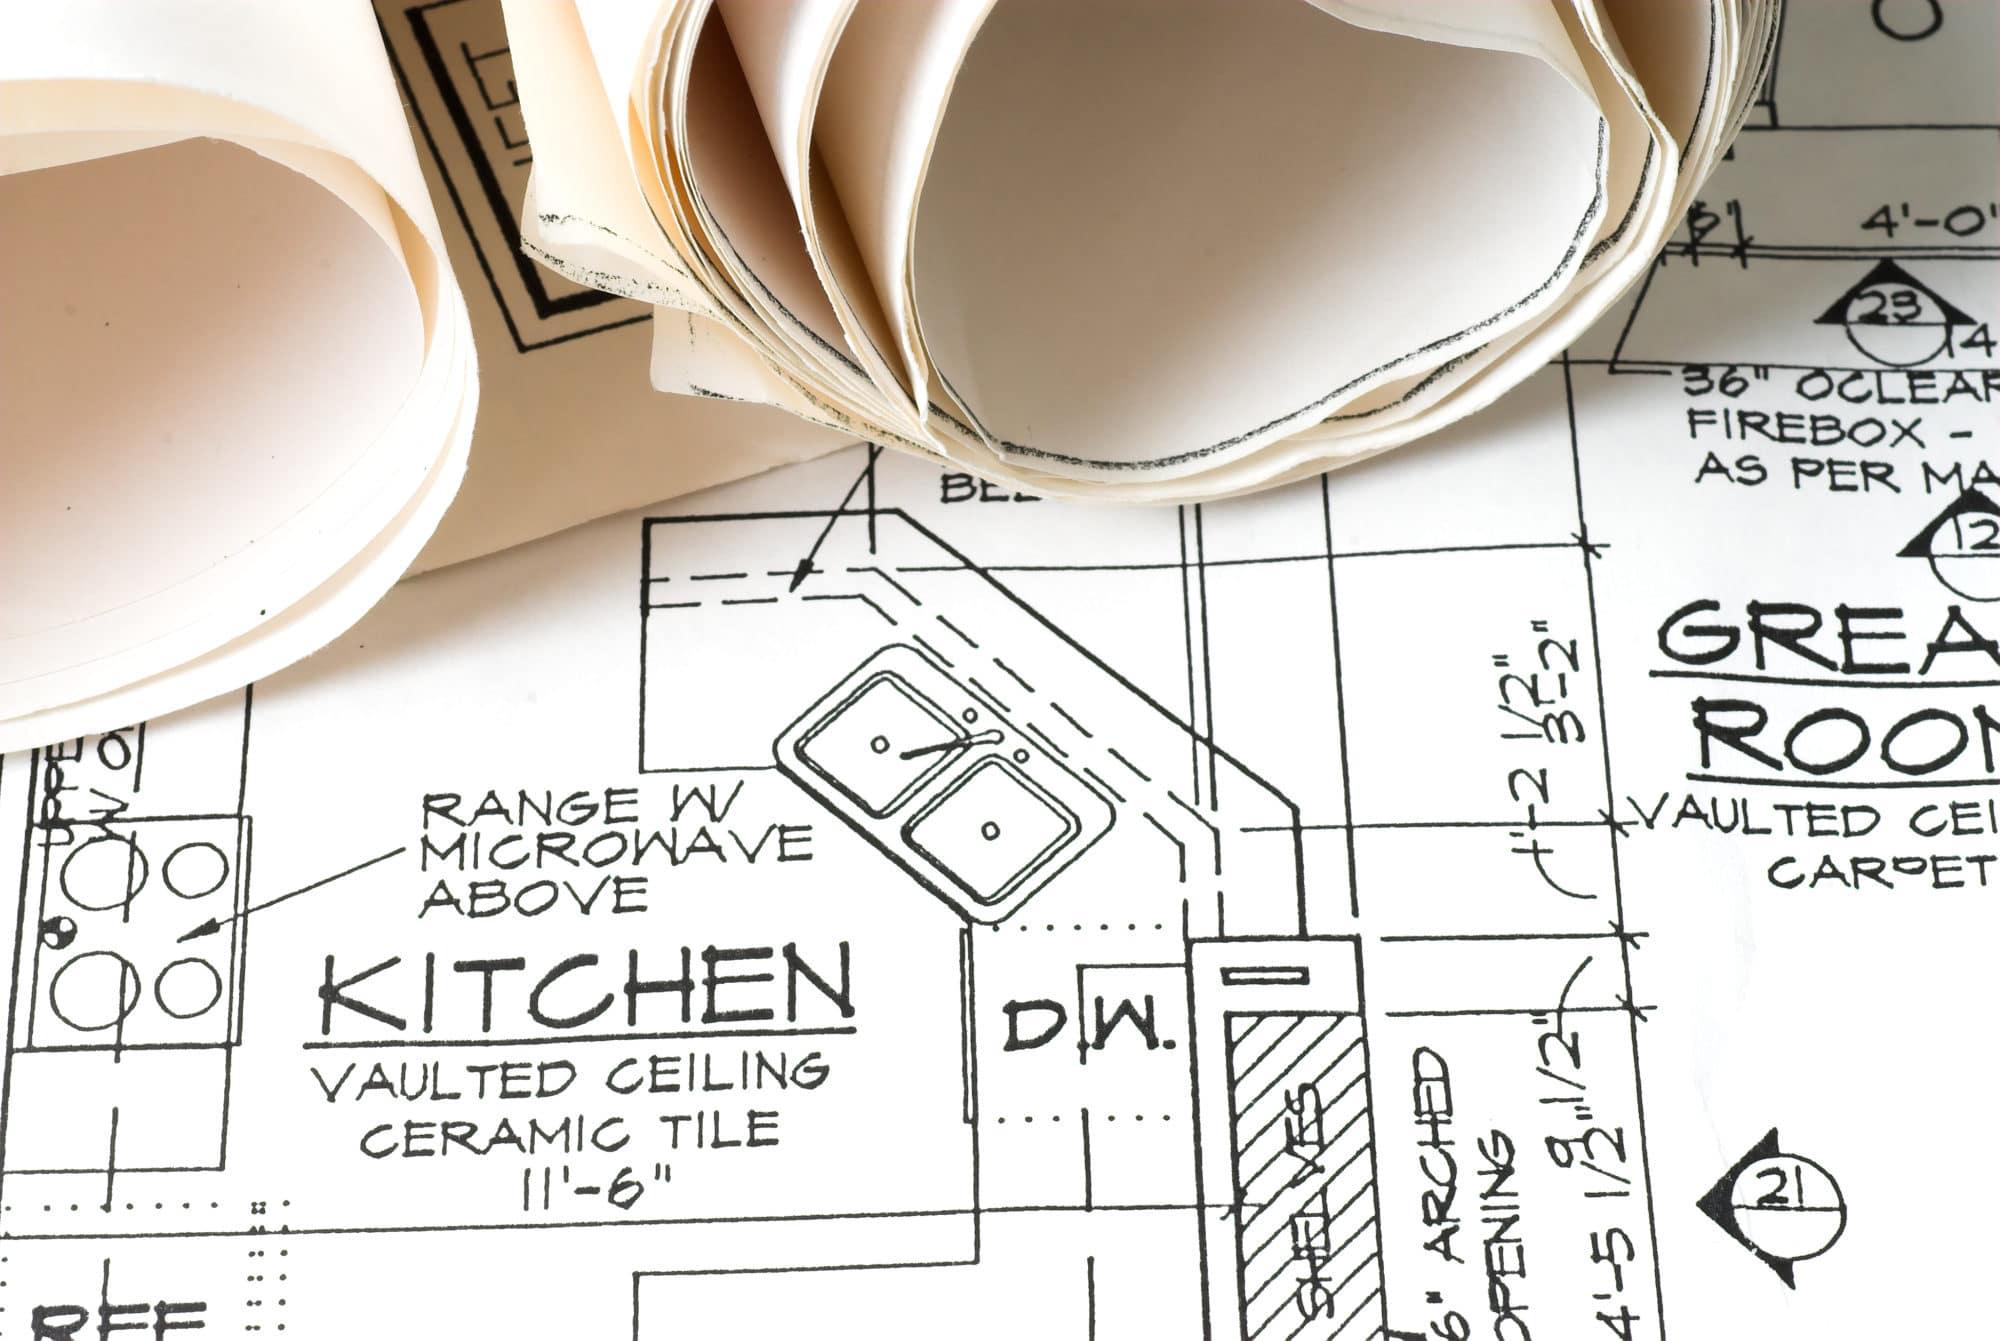 J Kitchen Sierra Vista Menu Of Residential Home Blueprints Sierra Remodeling